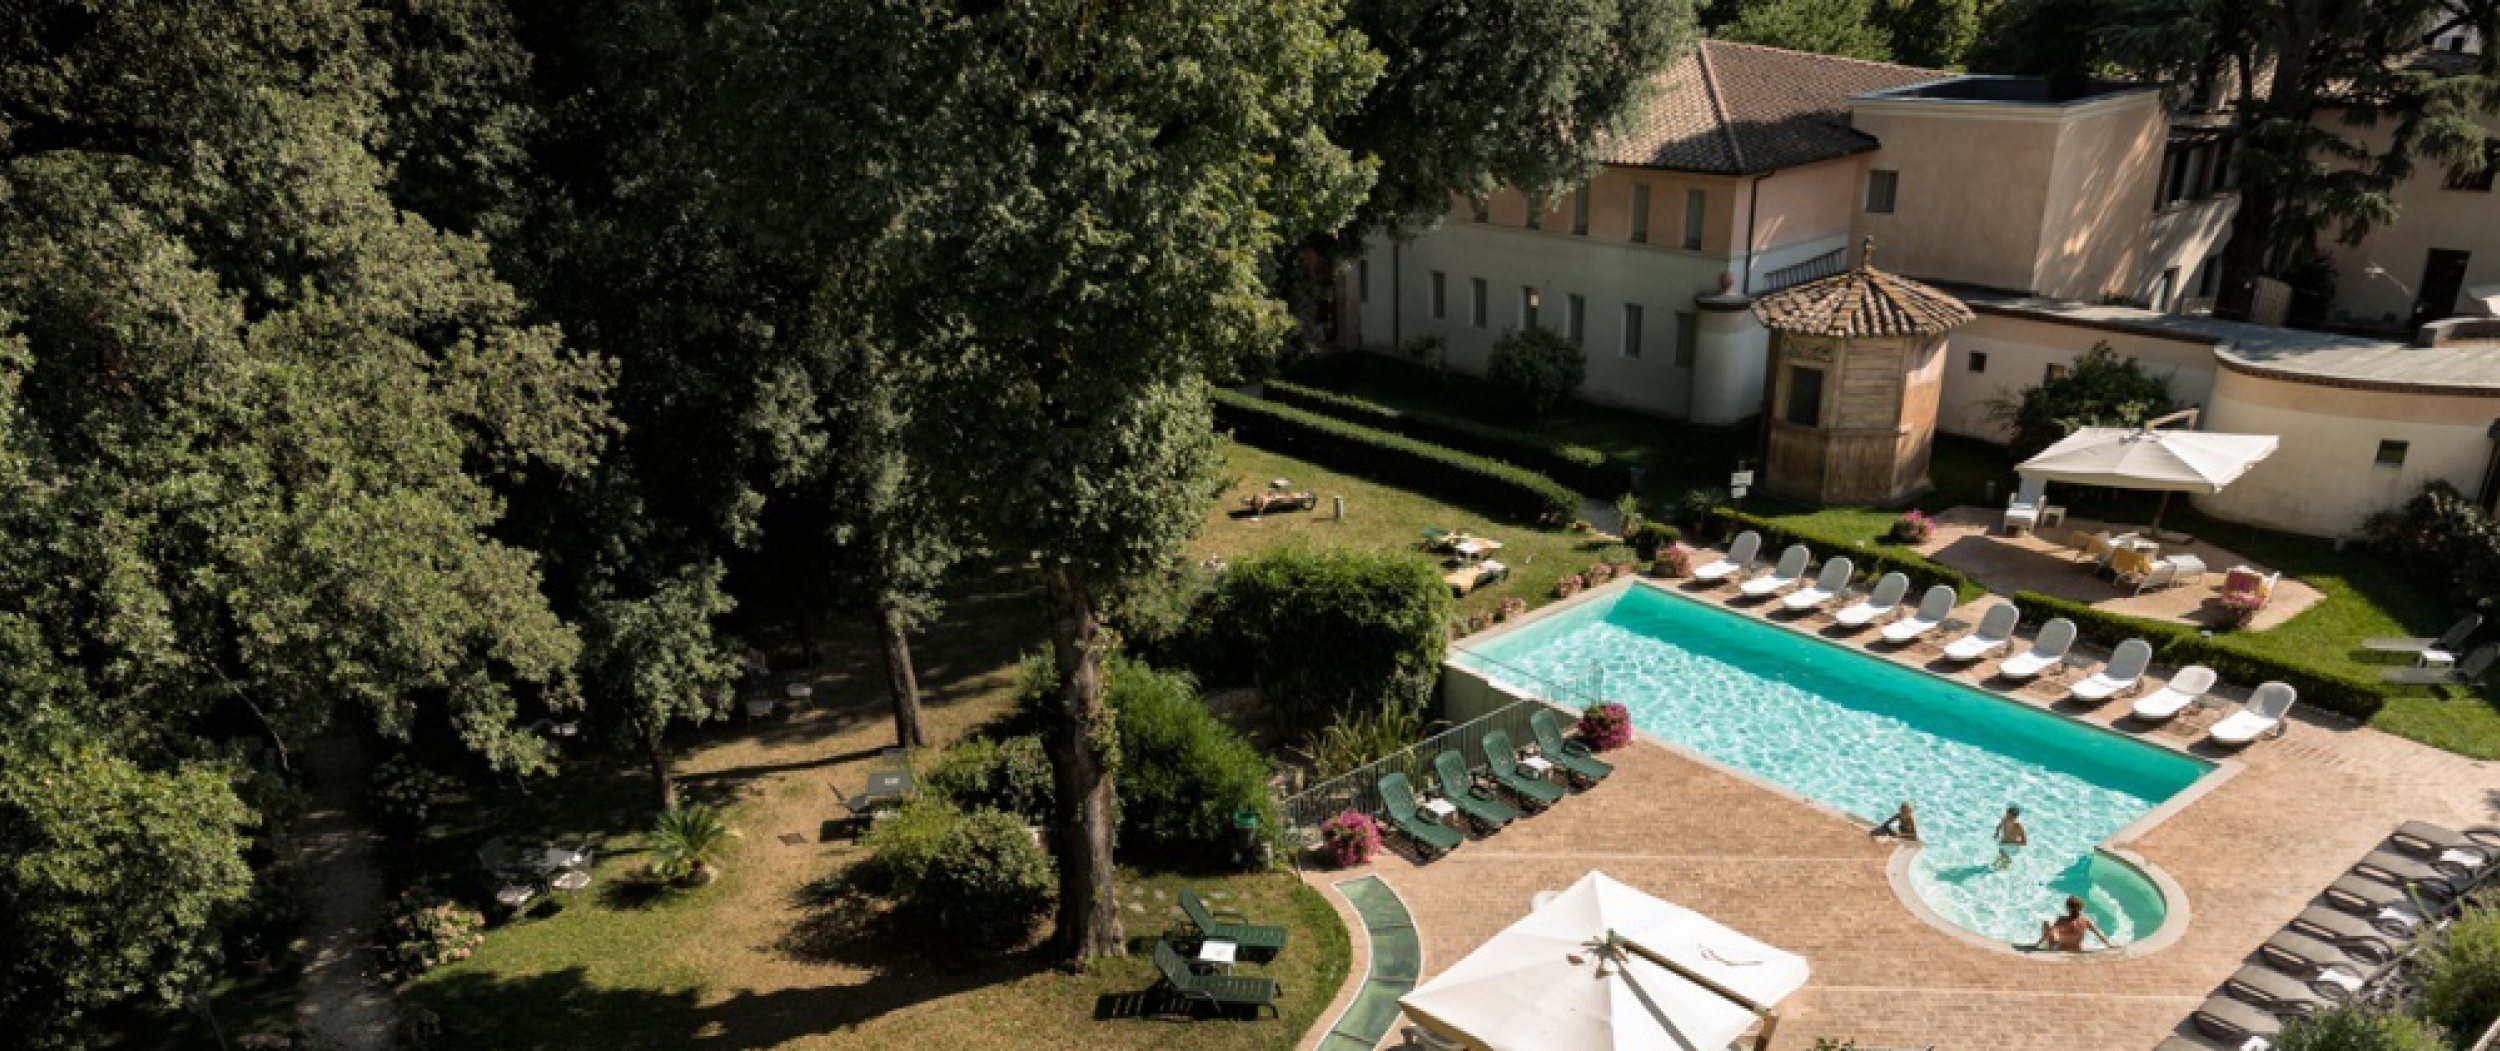 Best Hotel Websites | Alla Posta dei Donini